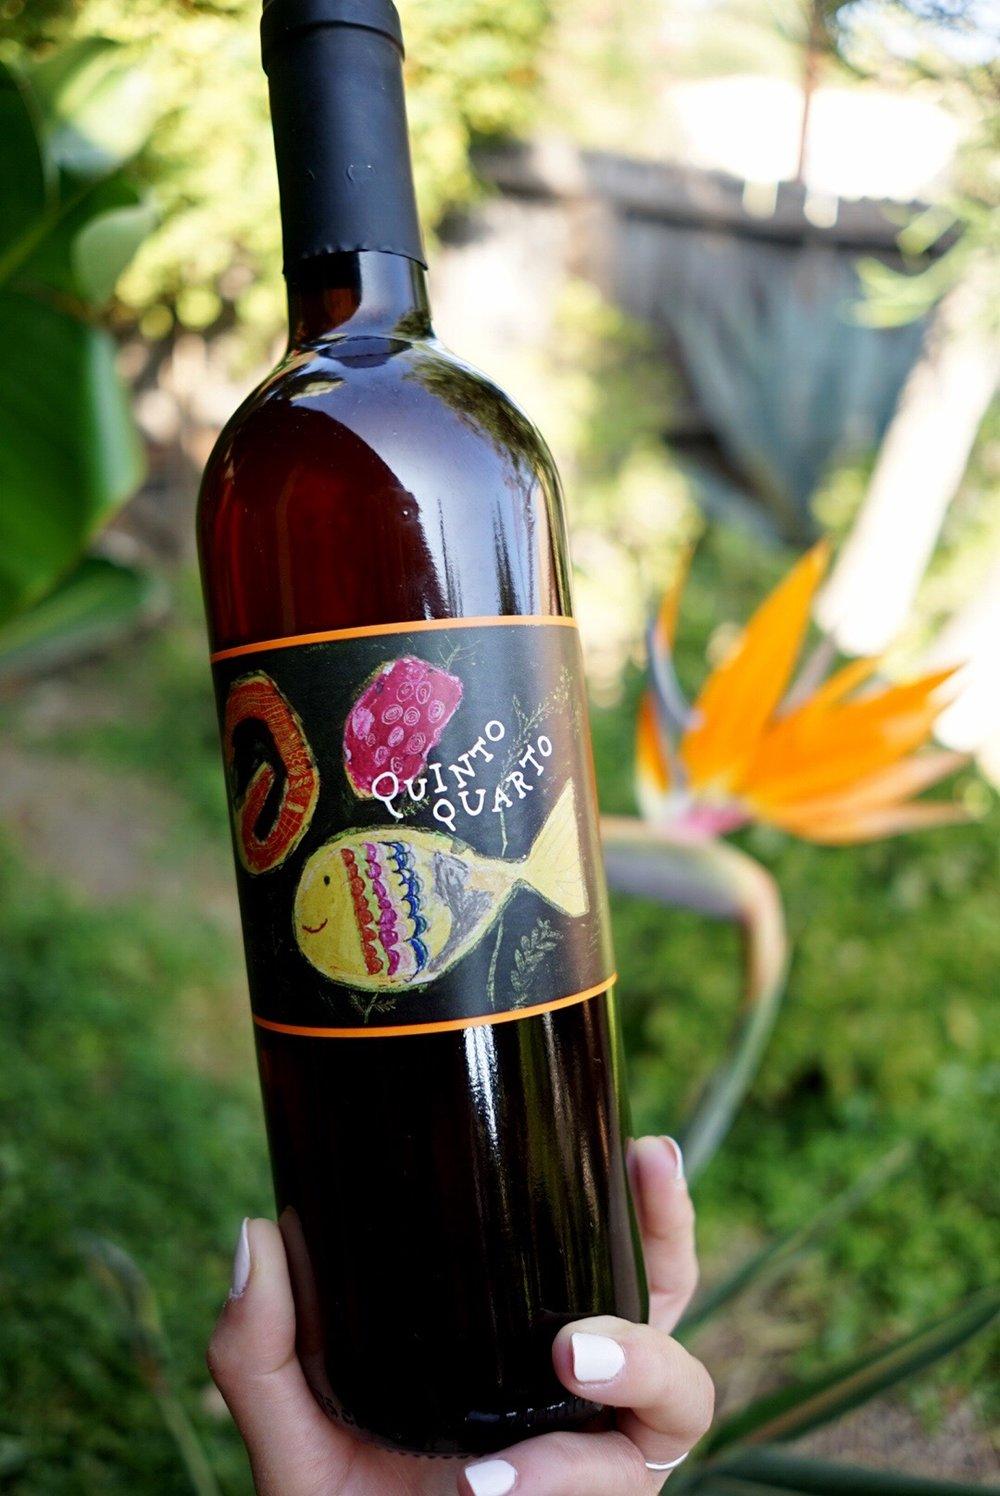 Terpin Quinto Quarto Pinot Grigio Marissa Ross